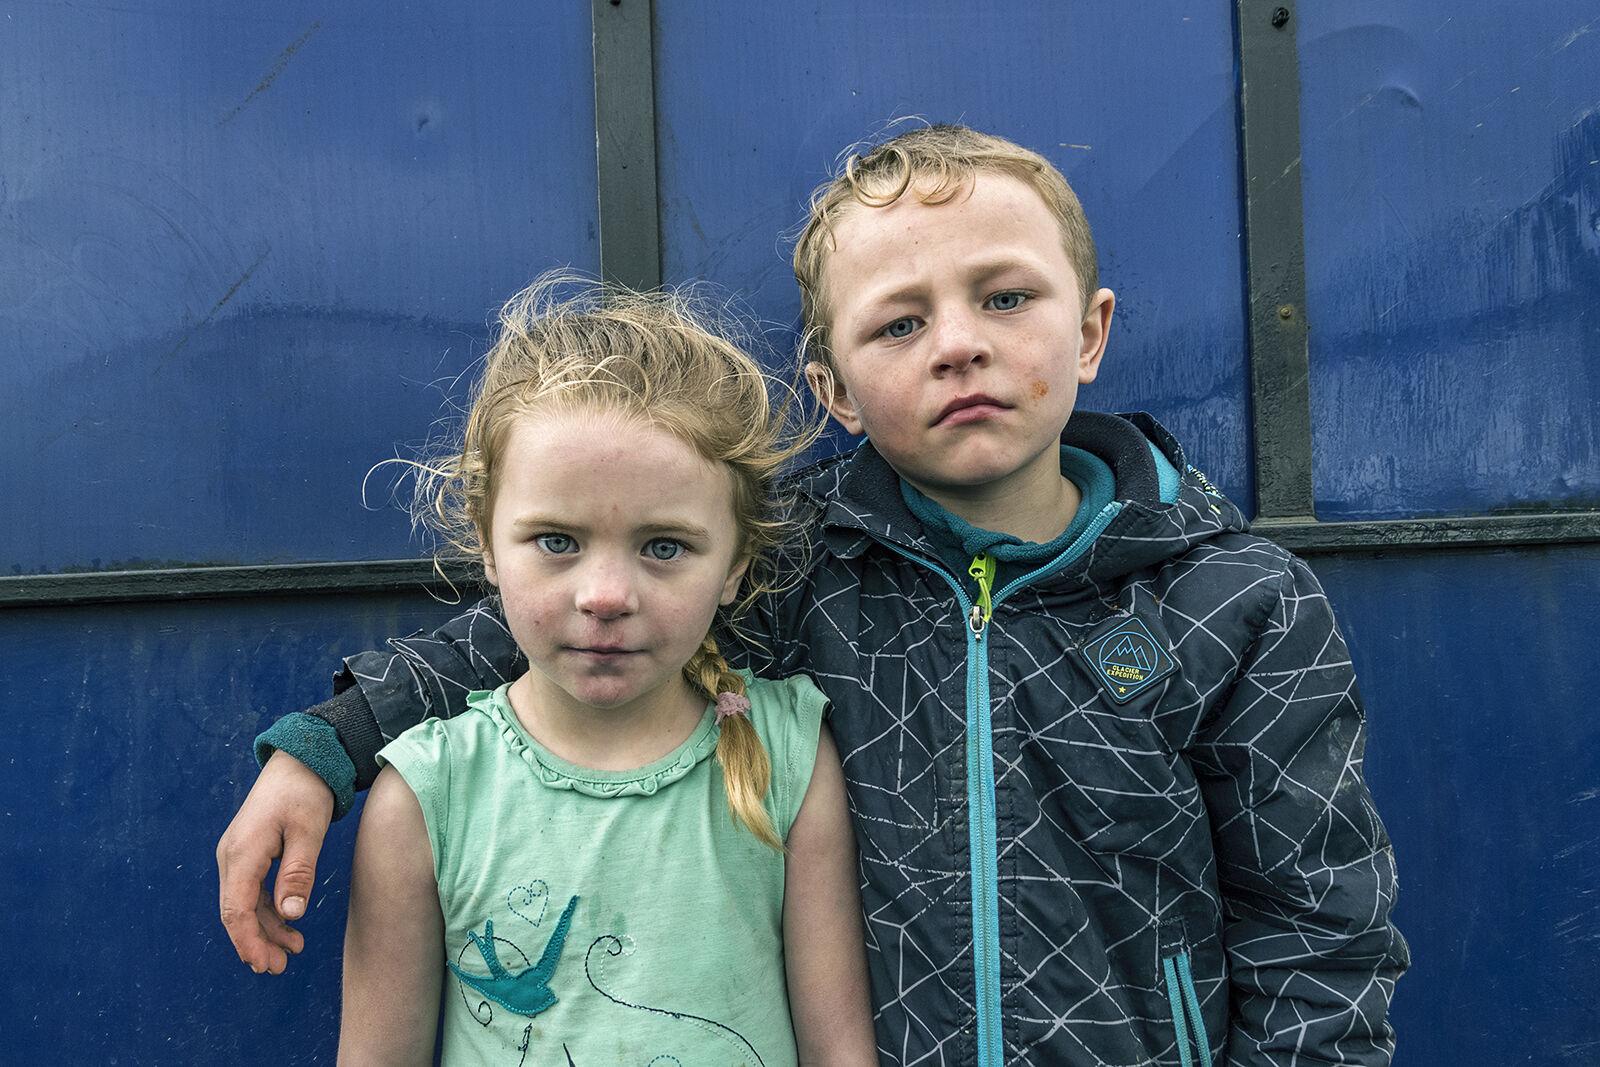 Cheyenne and Pa, Tipperary, Ireland 2019